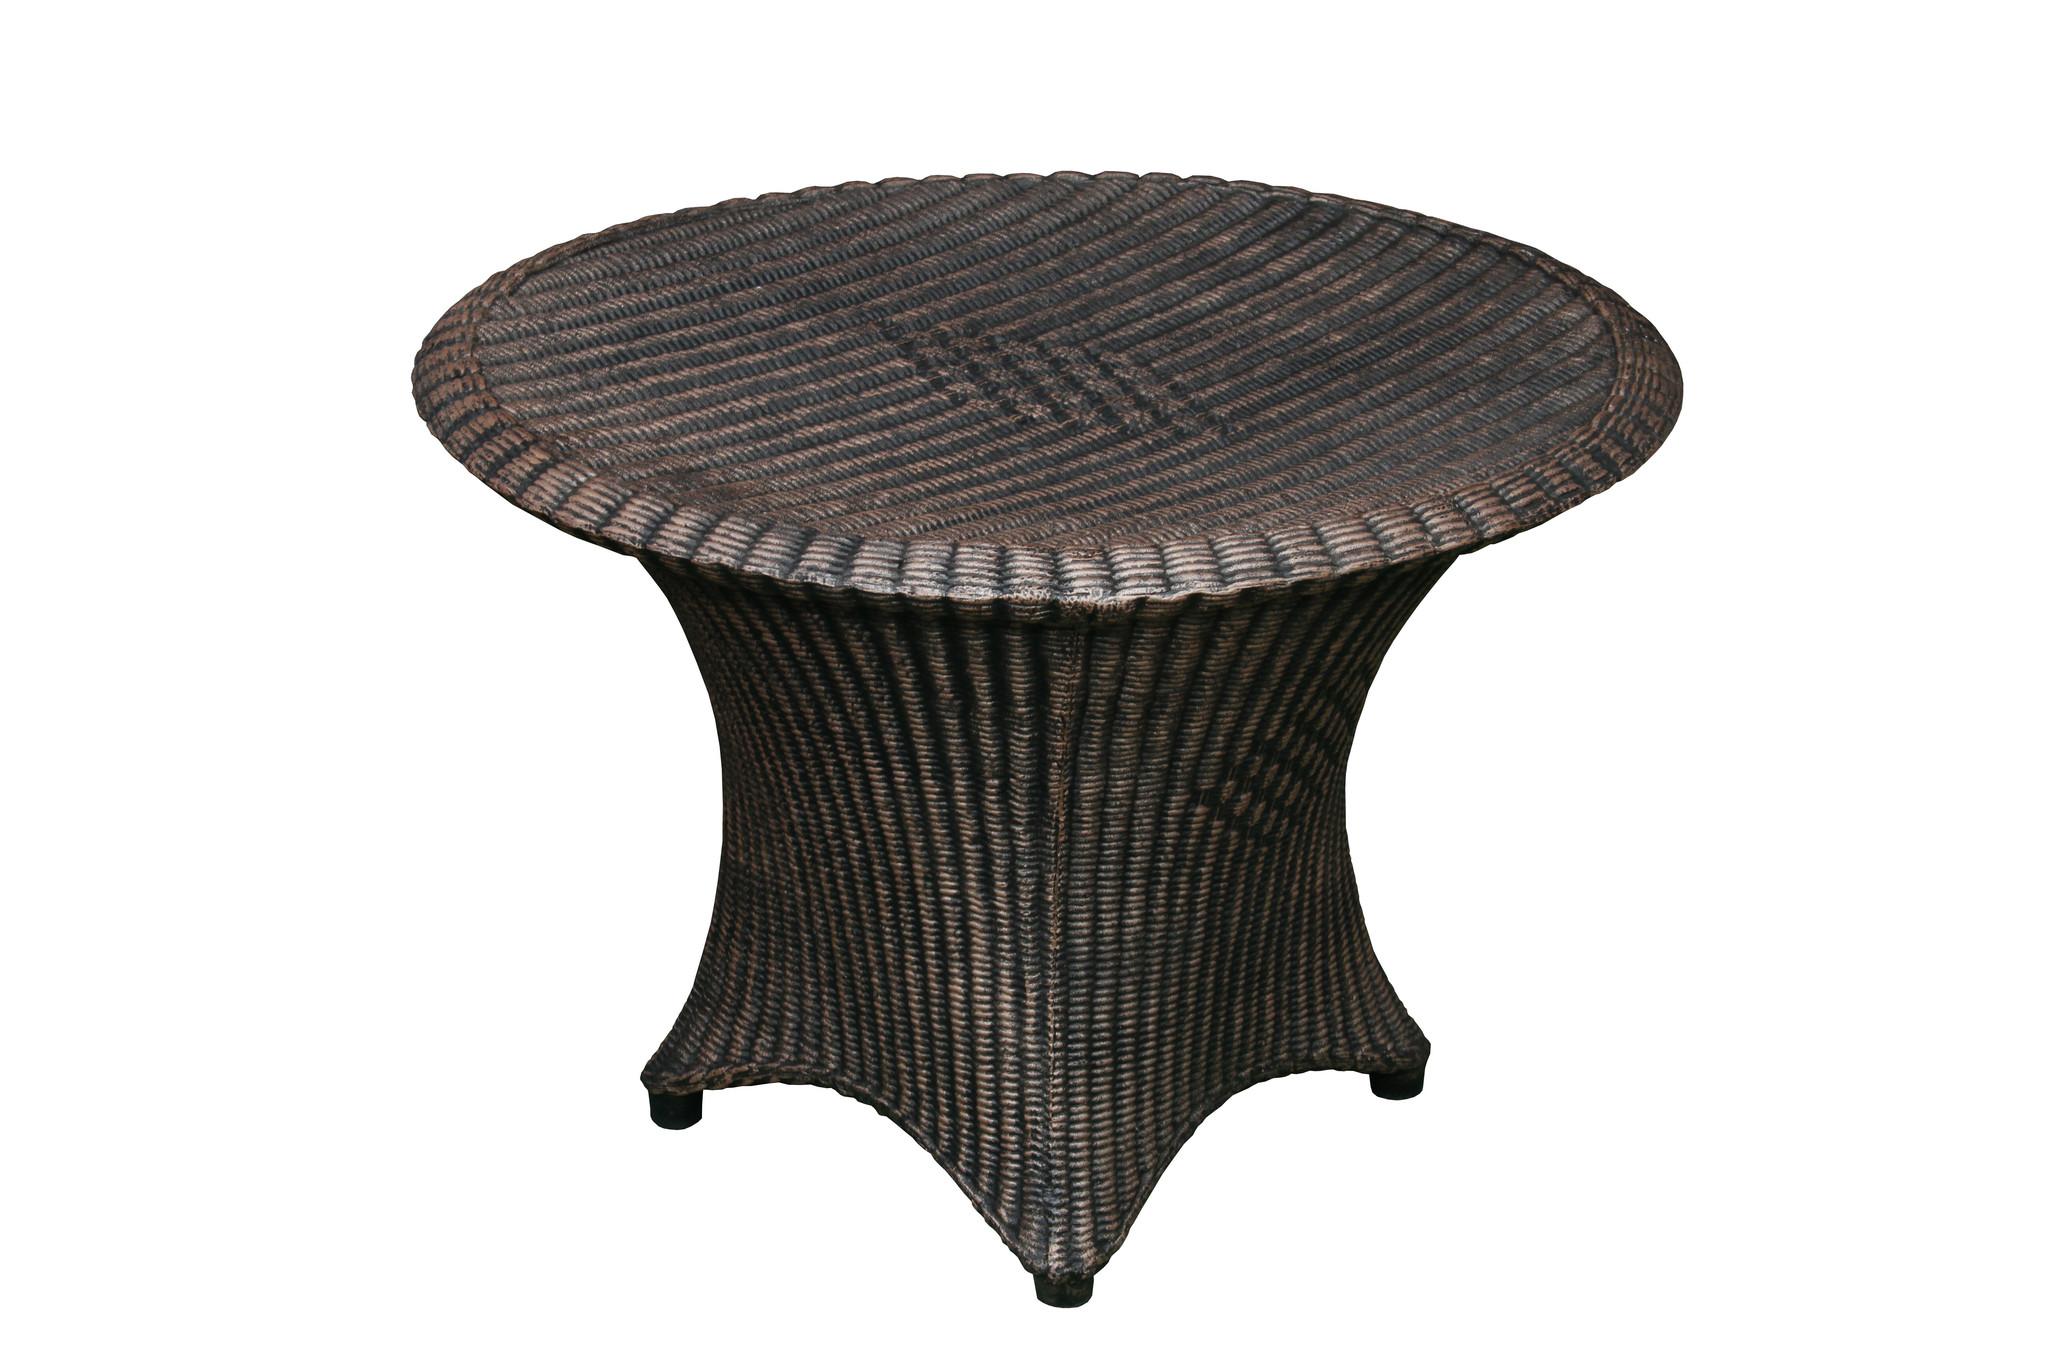 СтолСтолы и столики для сада<br><br><br>Material: Пластик<br>Height см: 47<br>Diameter см: 67